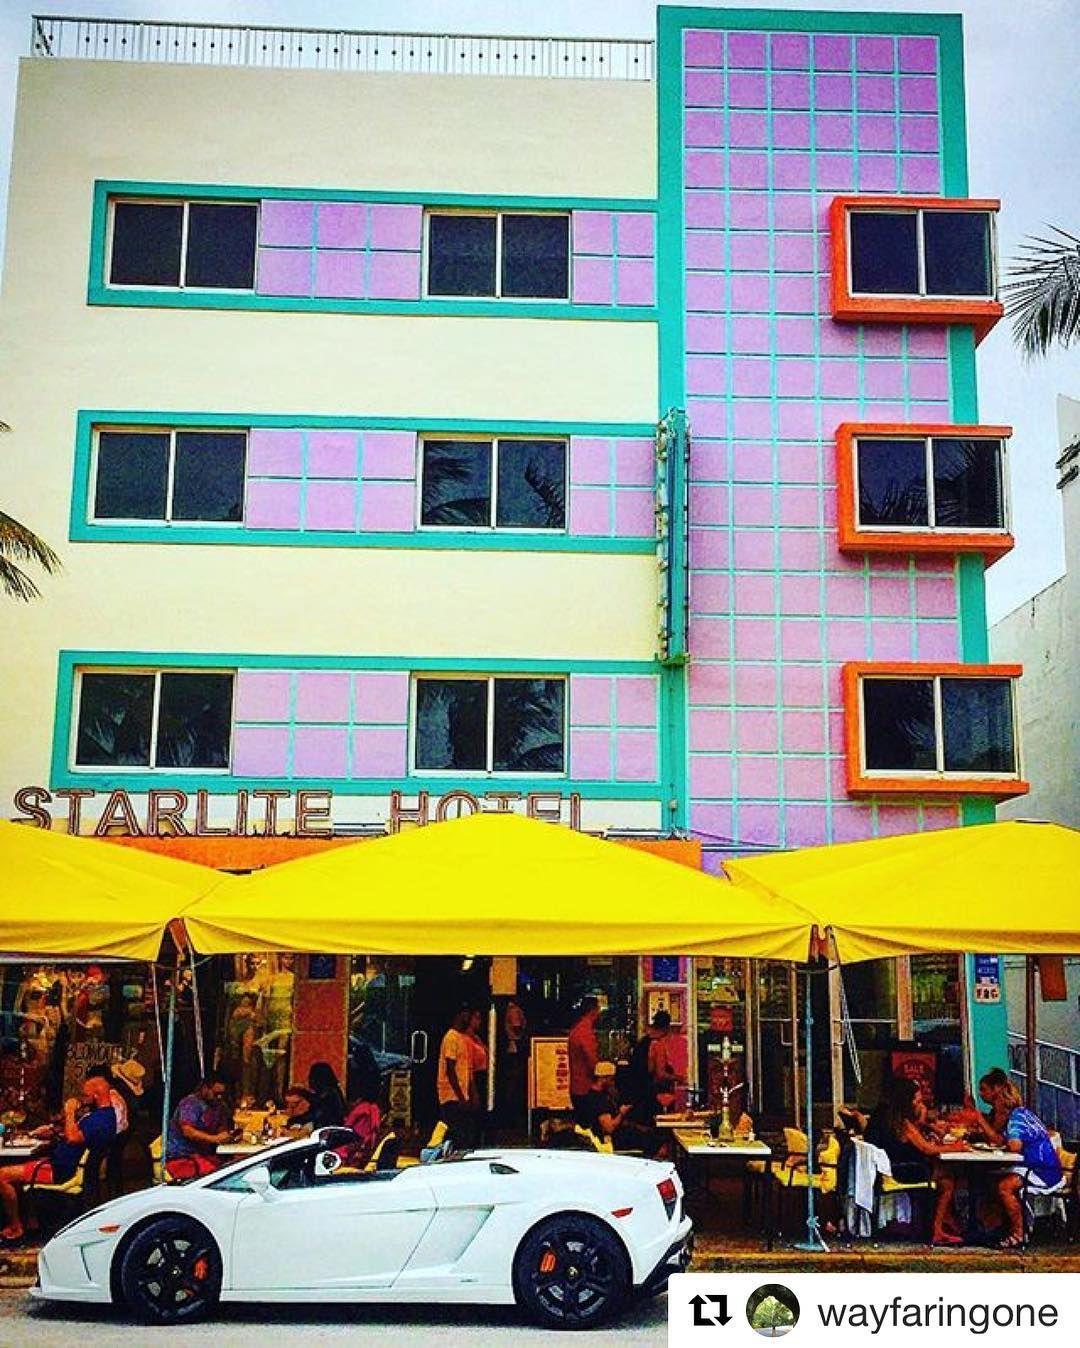 Thursdayviews The Starlite Hotel